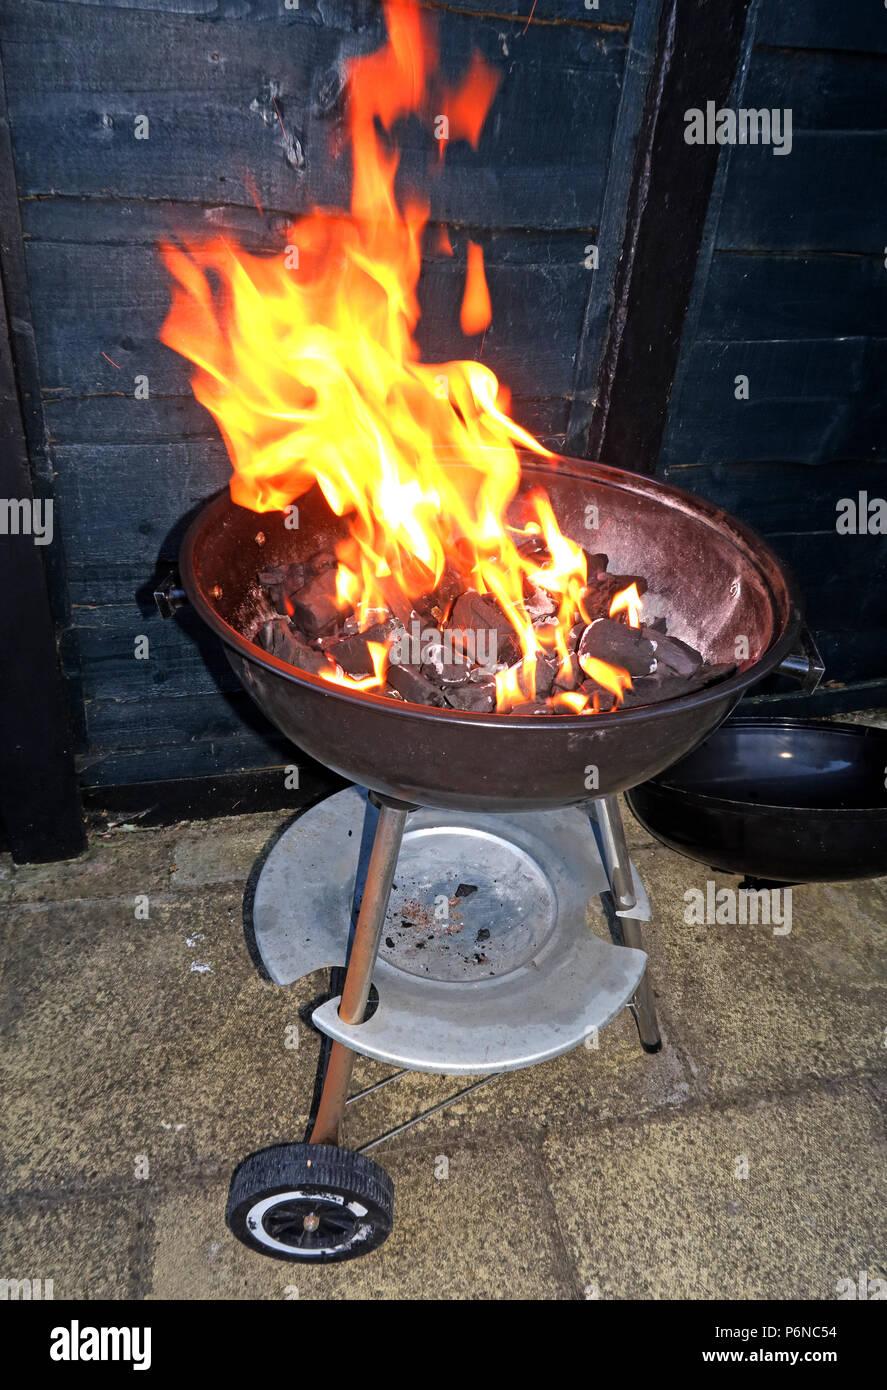 @Hotpixuk,GoTonySmith,flame,flames,charcoal,garden,garden BBQ,food safety,in the garden,cook,cooking,BBQ,Barbecue